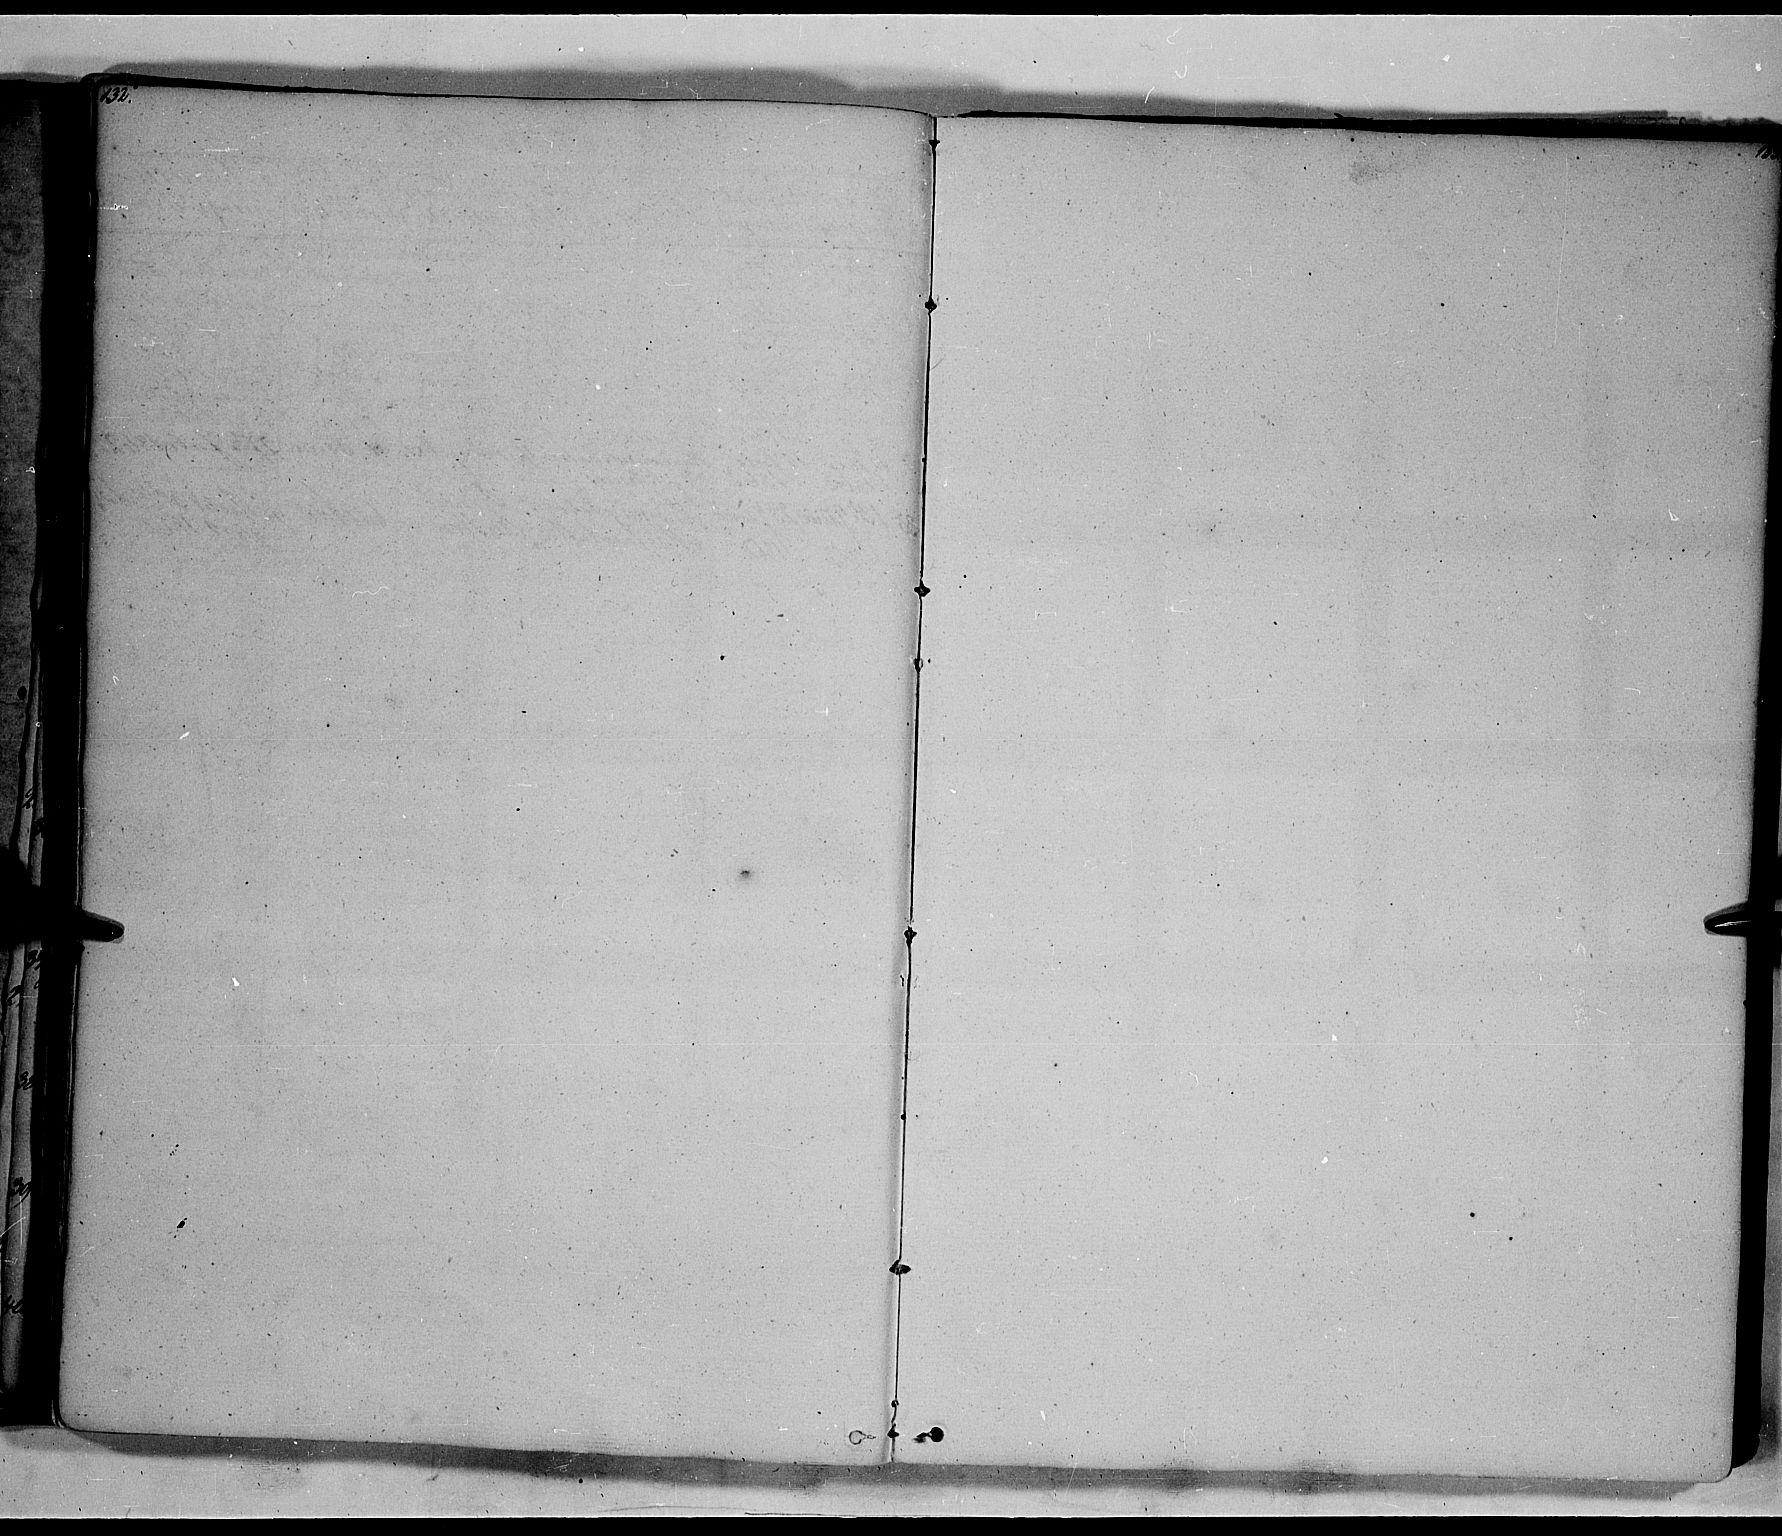 SAH, Lesja prestekontor, Klokkerbok nr. 3, 1842-1862, s. 132-133